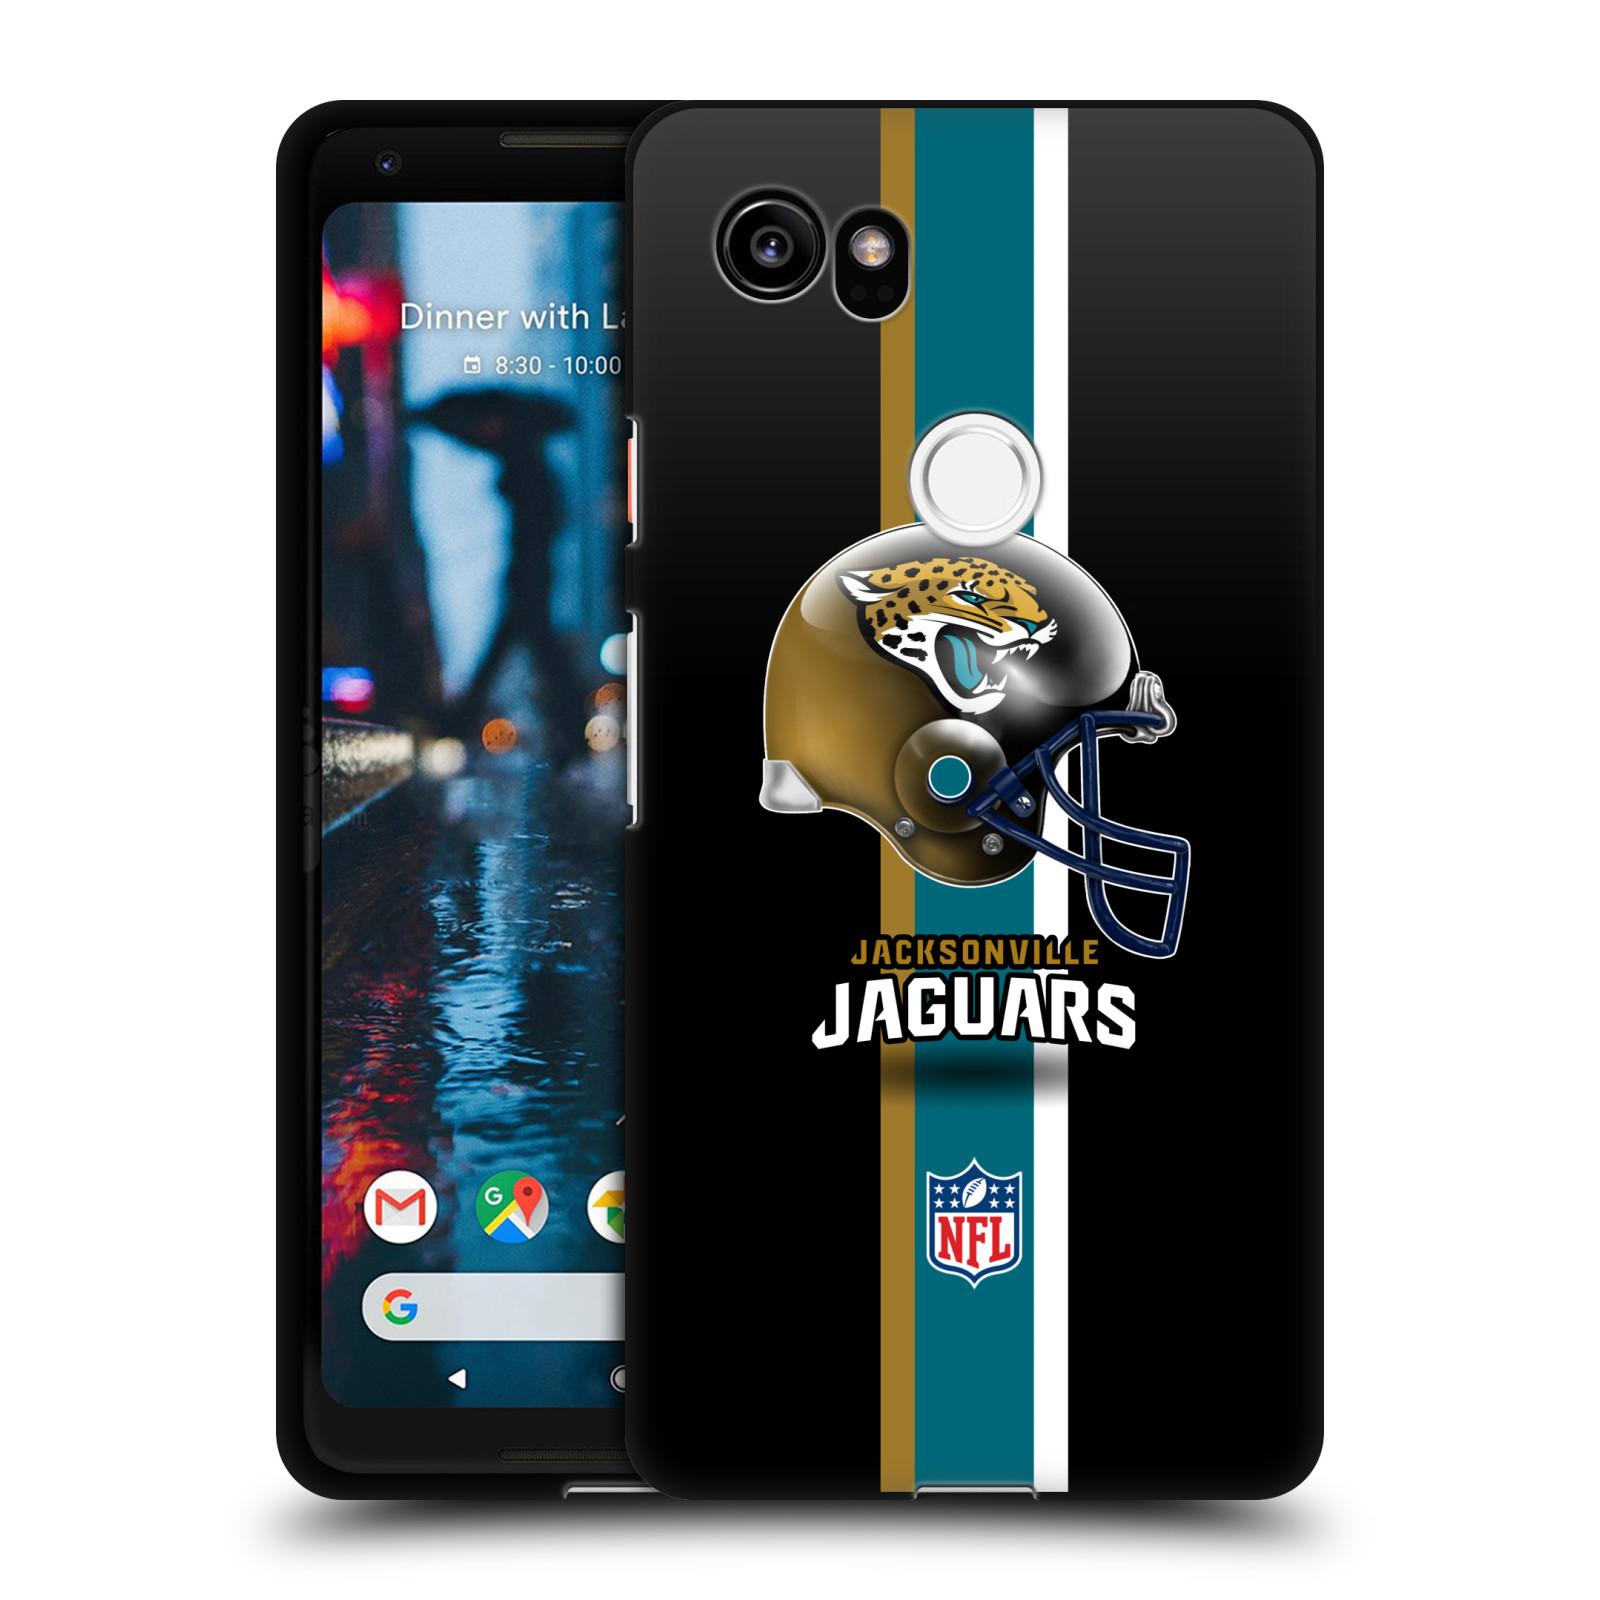 UFFICIALE-NFL-JACKSONVILLE-JAGUARS-LOGO-COVER-IN-GEL-NERA-PER-GOOGLE-TELEFONI